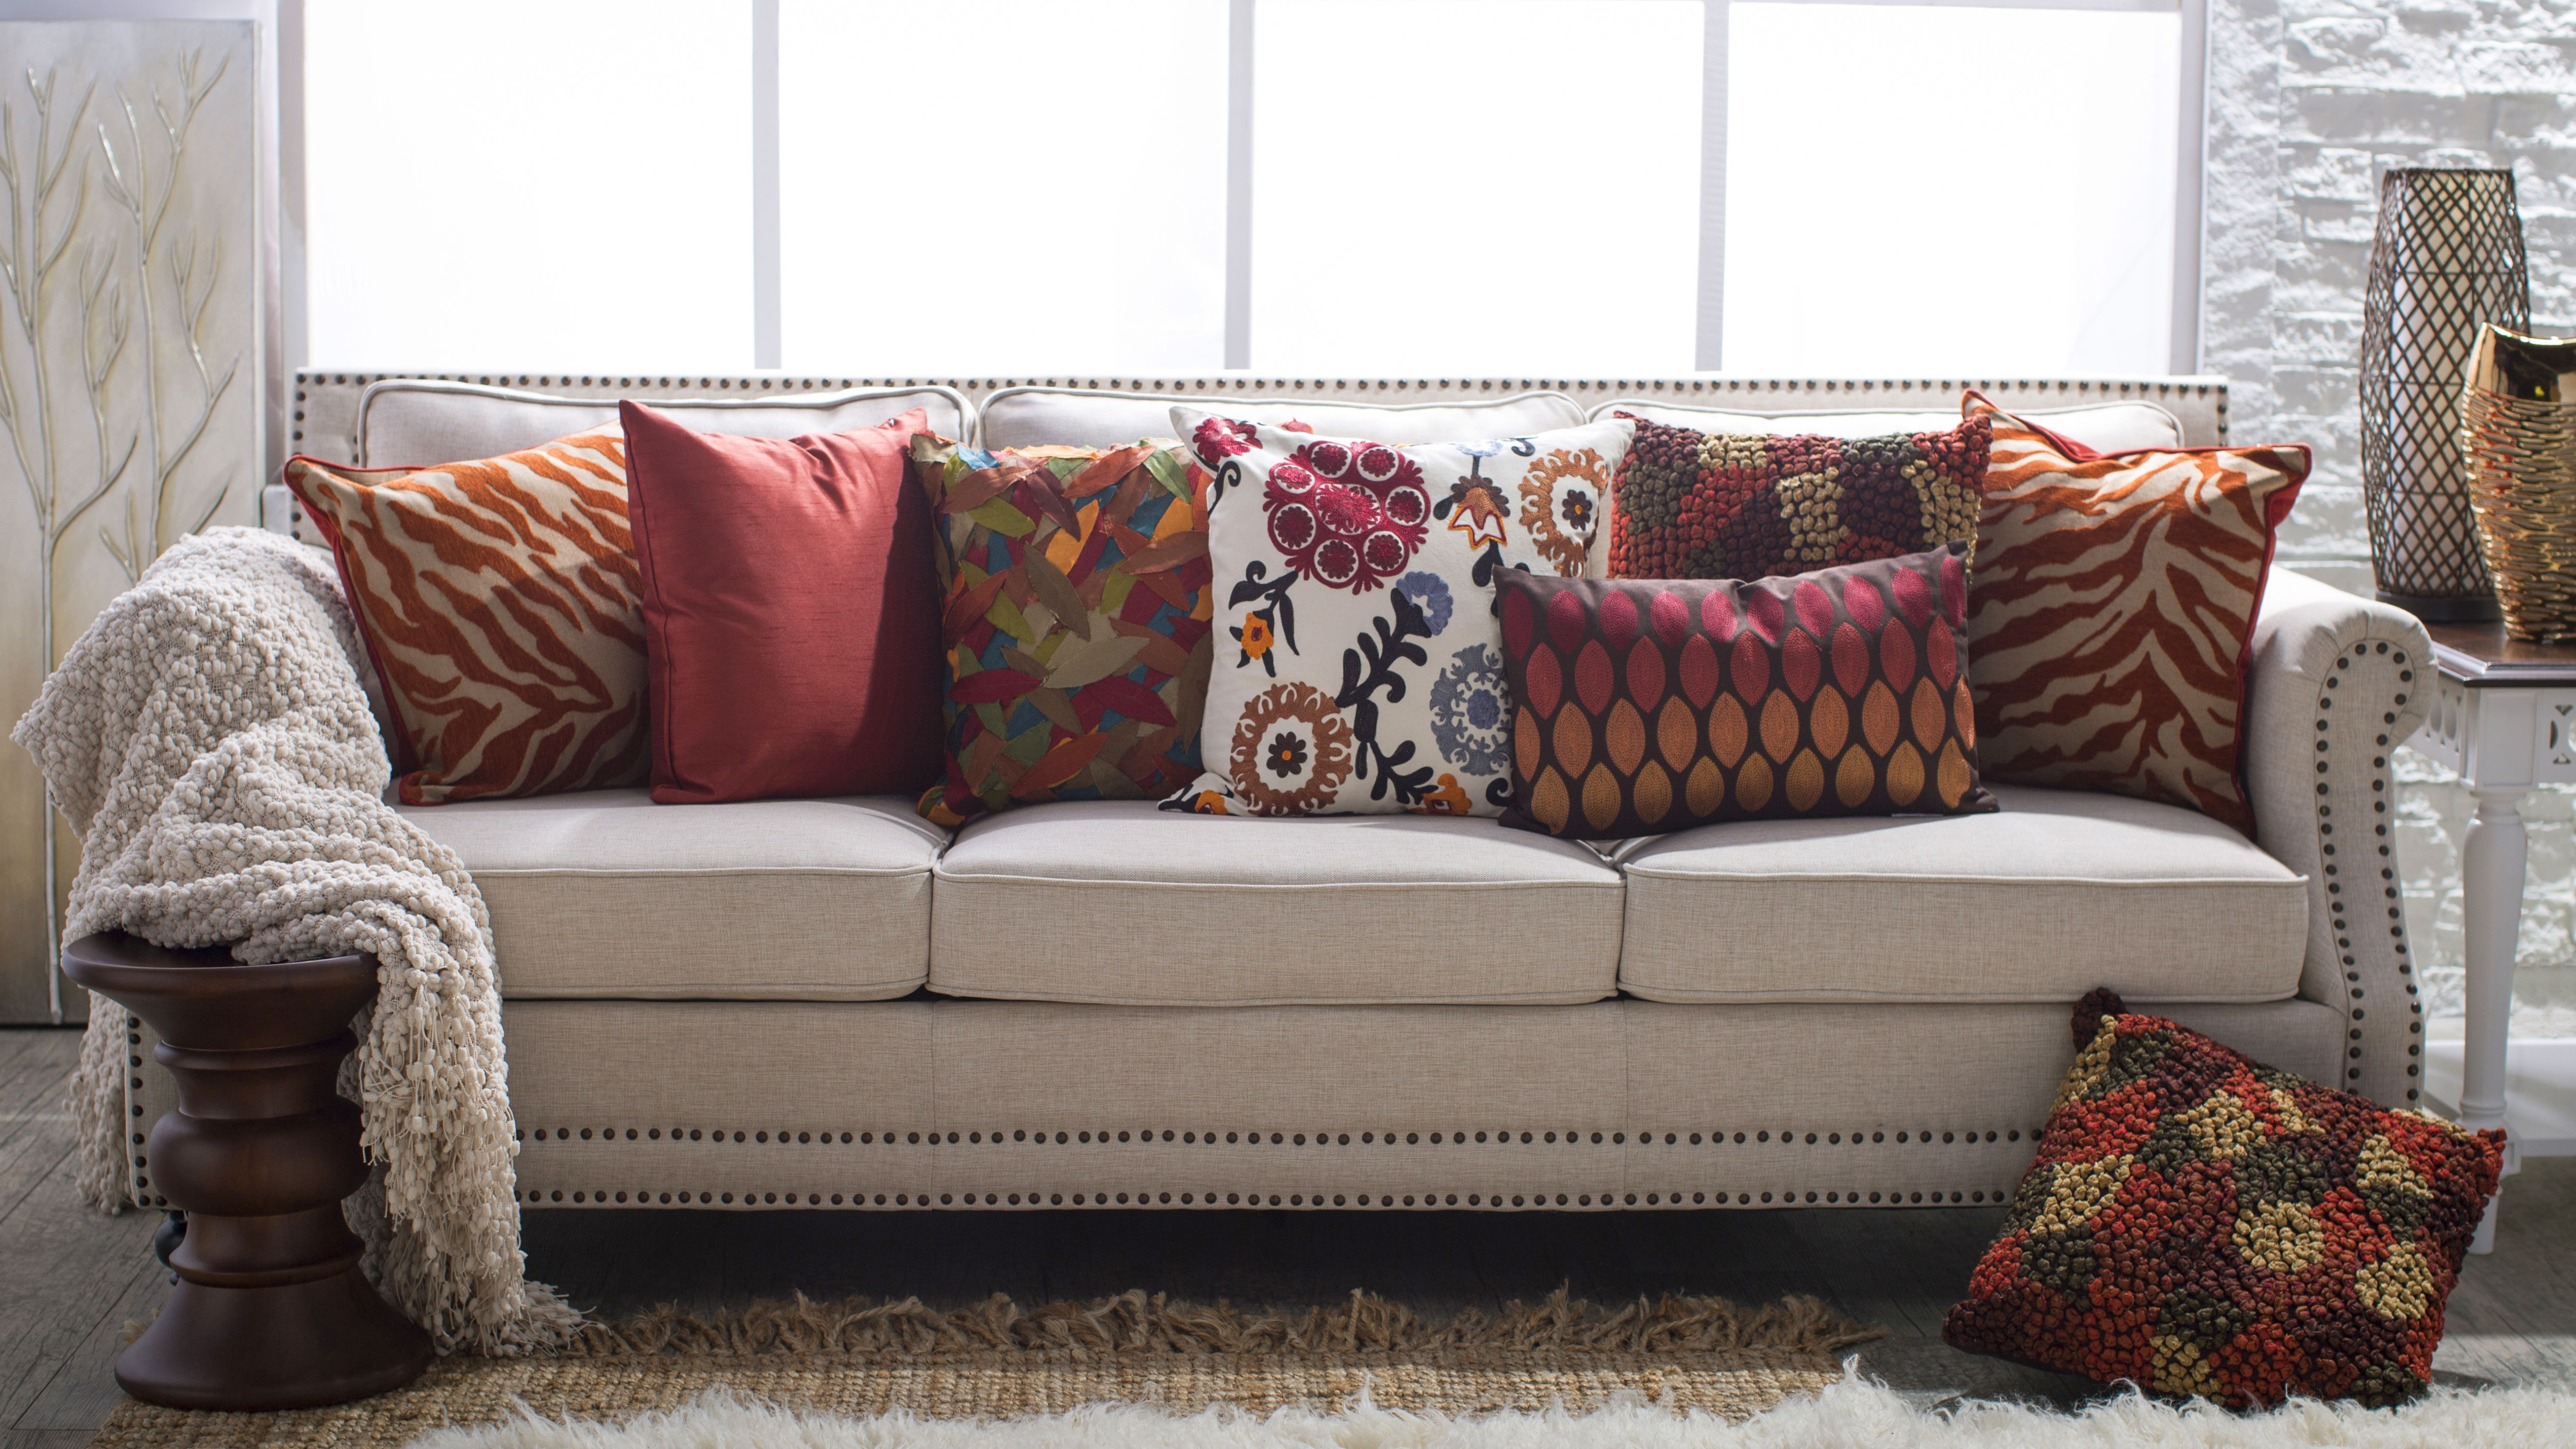 2b37584bf199829eb13fd7c743fe250e - Better Homes And Gardens Oxford Square Sofa Taupe